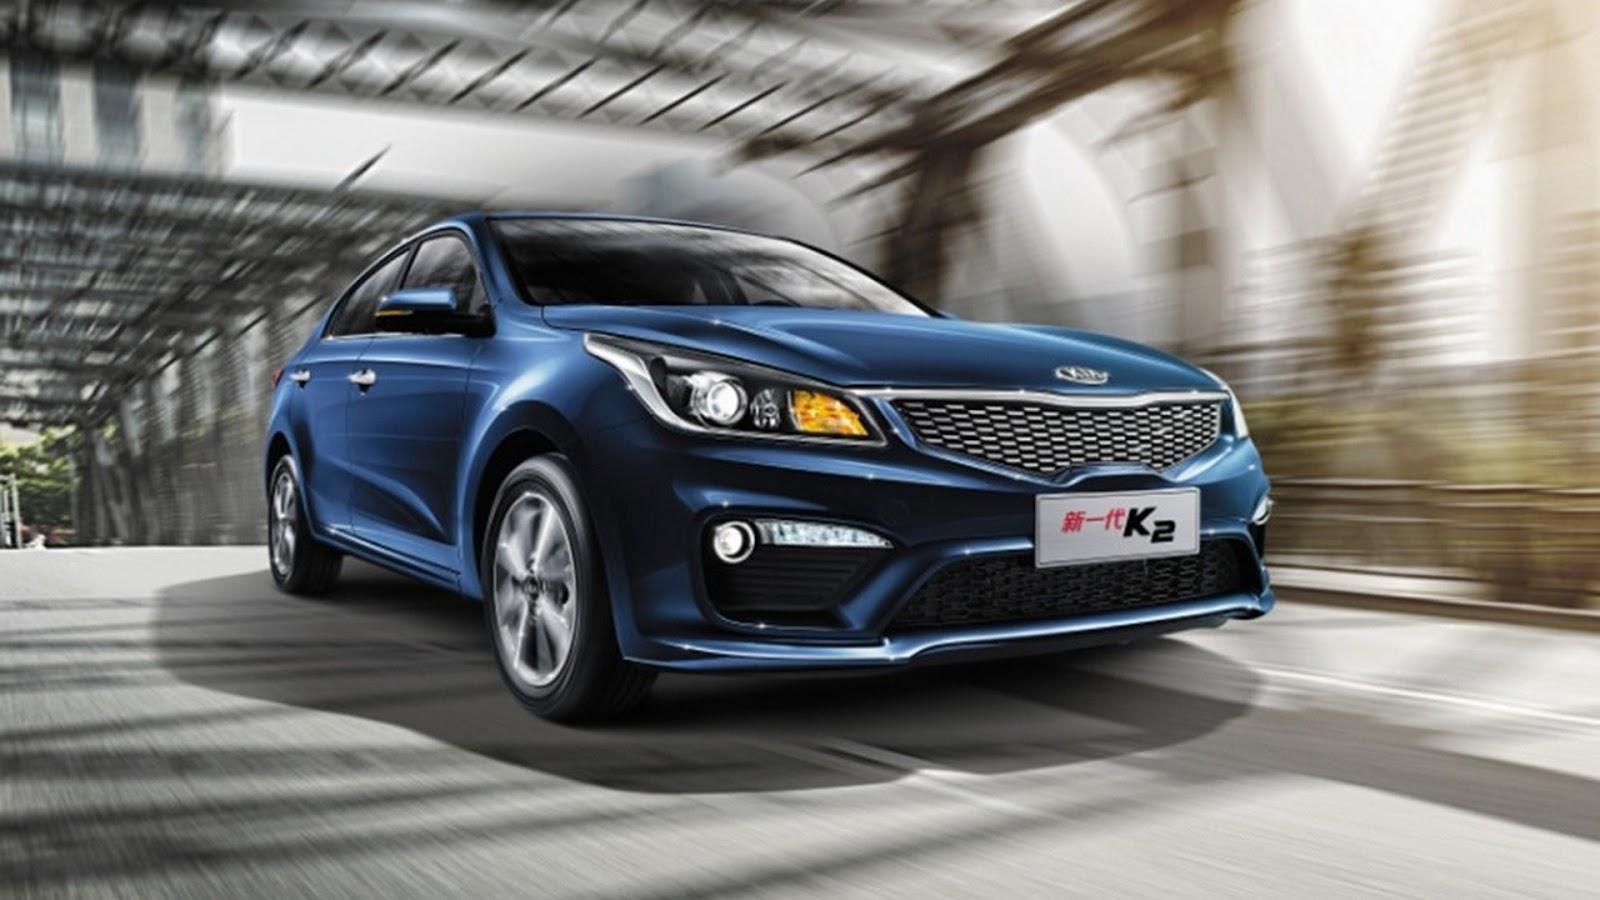 china 39 s 2018 kia k2 previews new rio sedan types cars. Black Bedroom Furniture Sets. Home Design Ideas